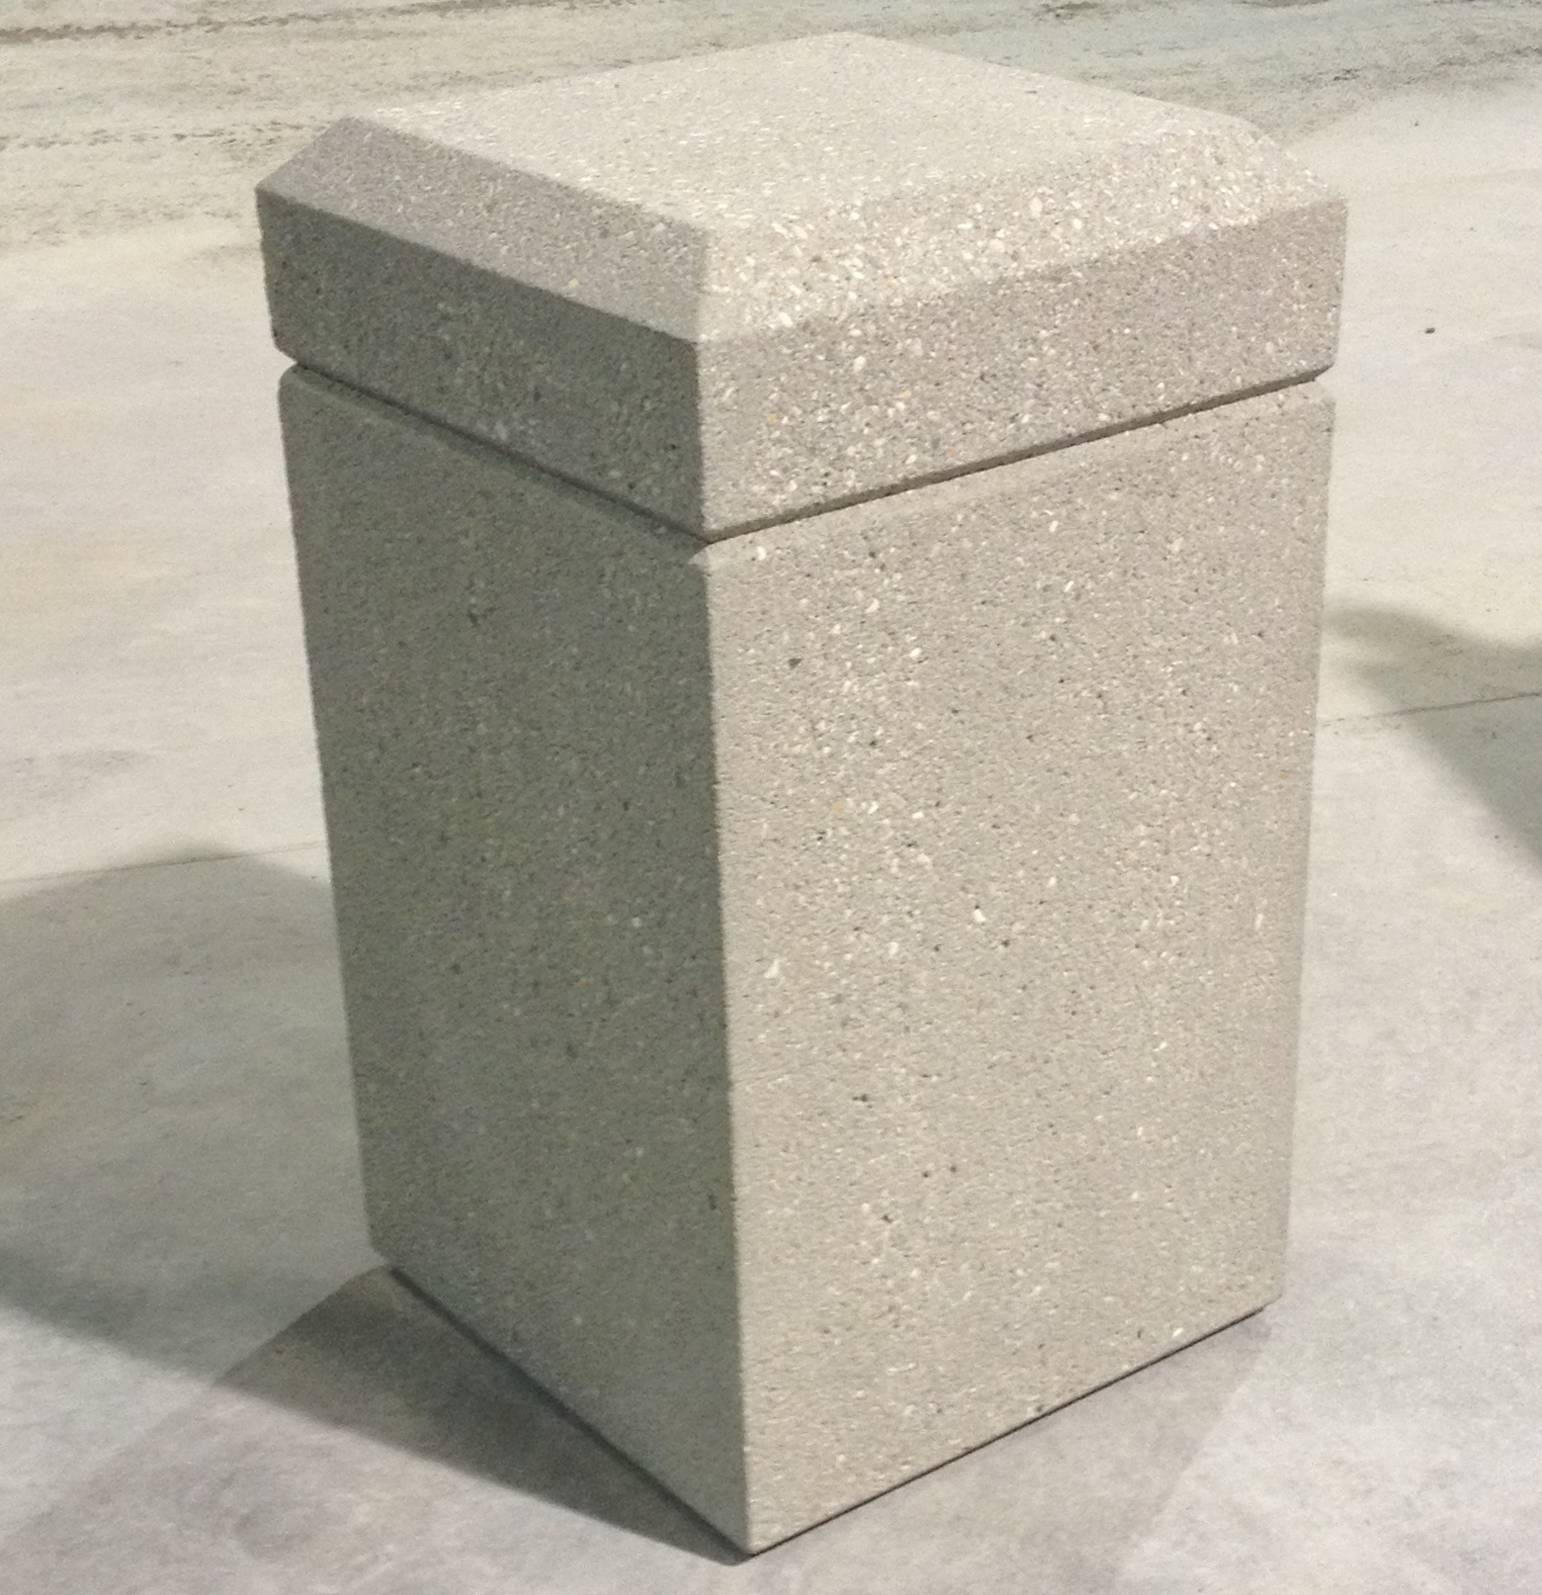 16 Quot Square Bollard B161628 Doty Concrete